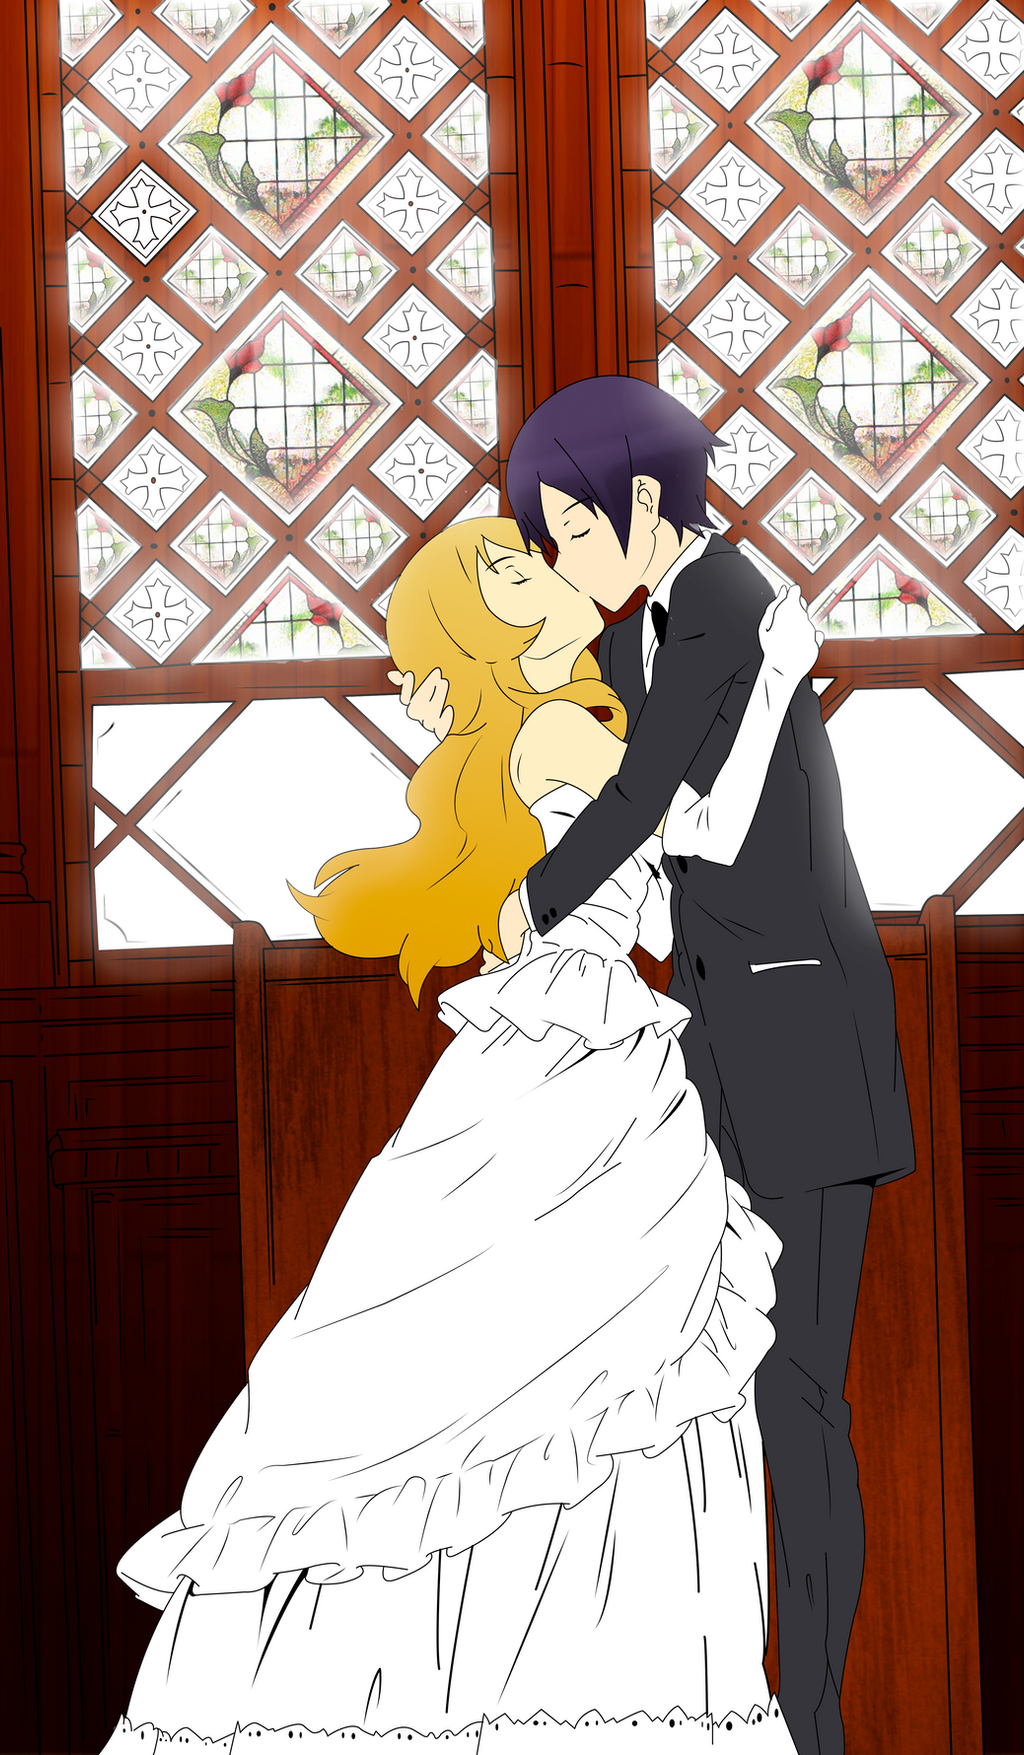 Kirino x Kyousuke Kiss by RegisNex79 on DeviantArt